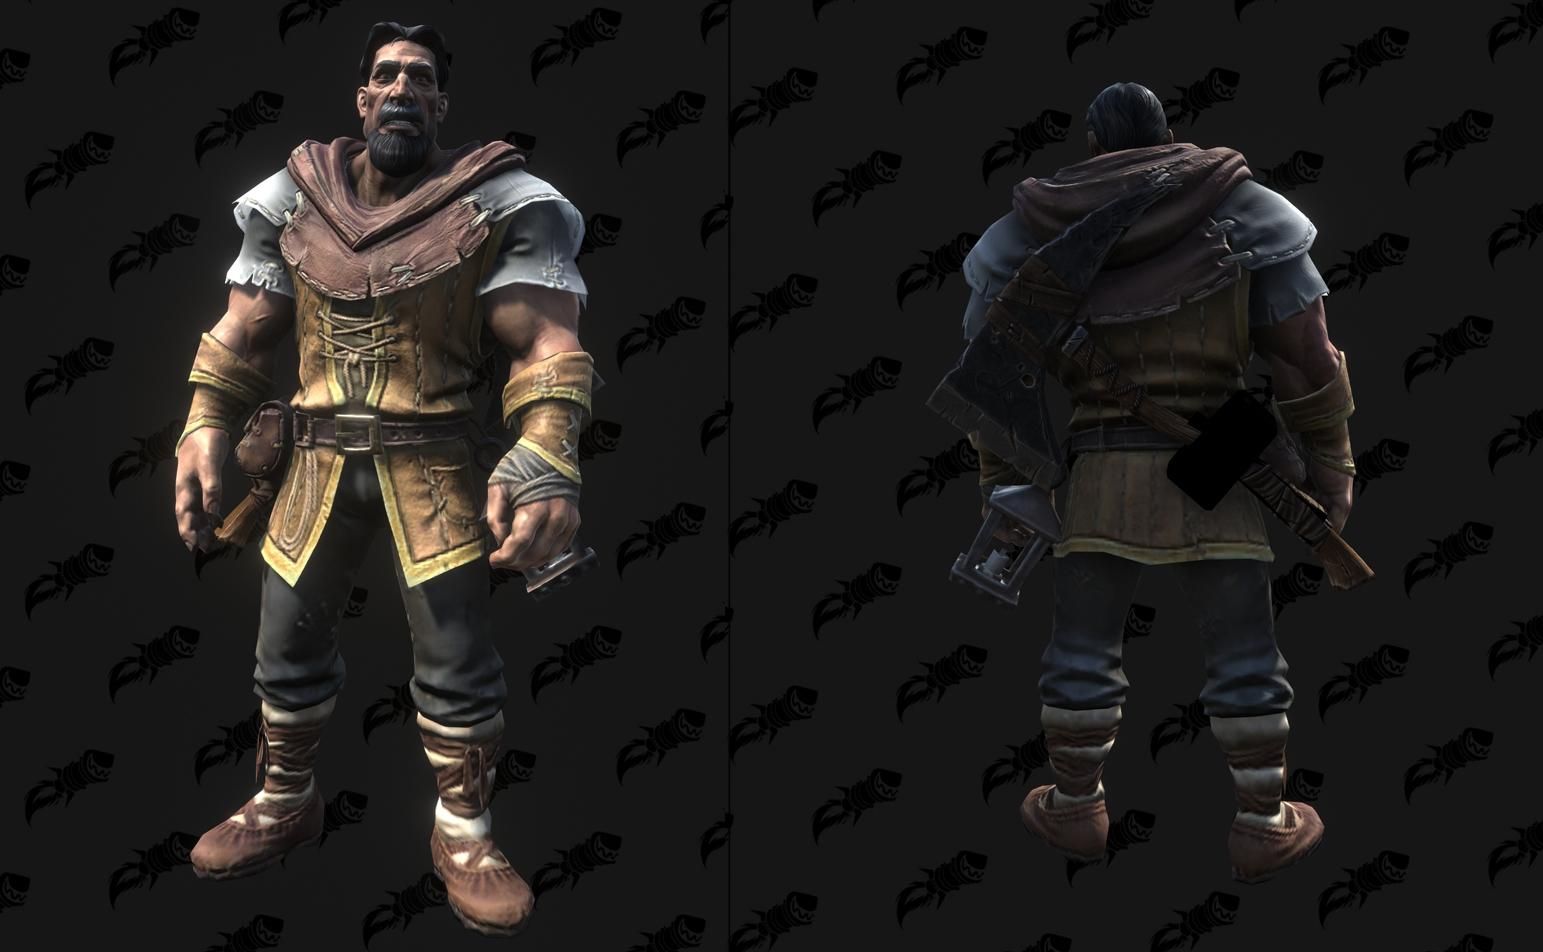 Modèle Warcraft III Reforged : Peasant